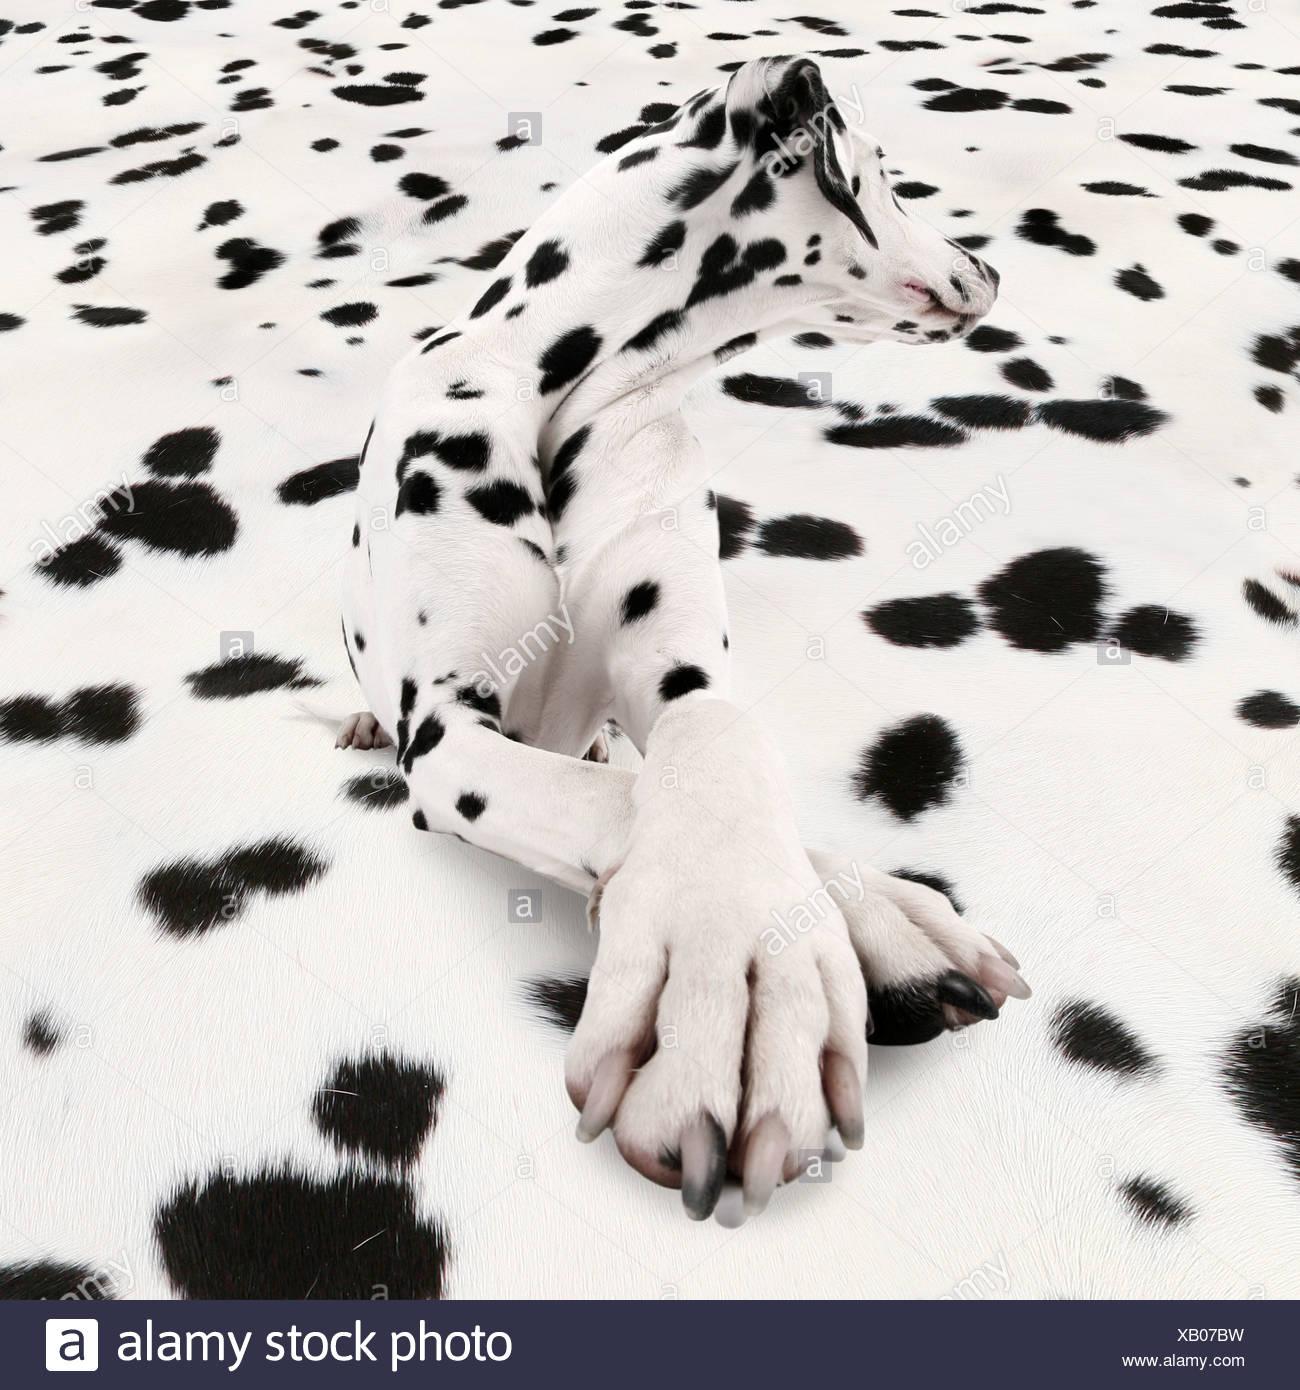 Dalmatian (Canis lupus f. familiaris), Dalmatiner lying on Dalmatiner carpet truning astonished - Stock Image